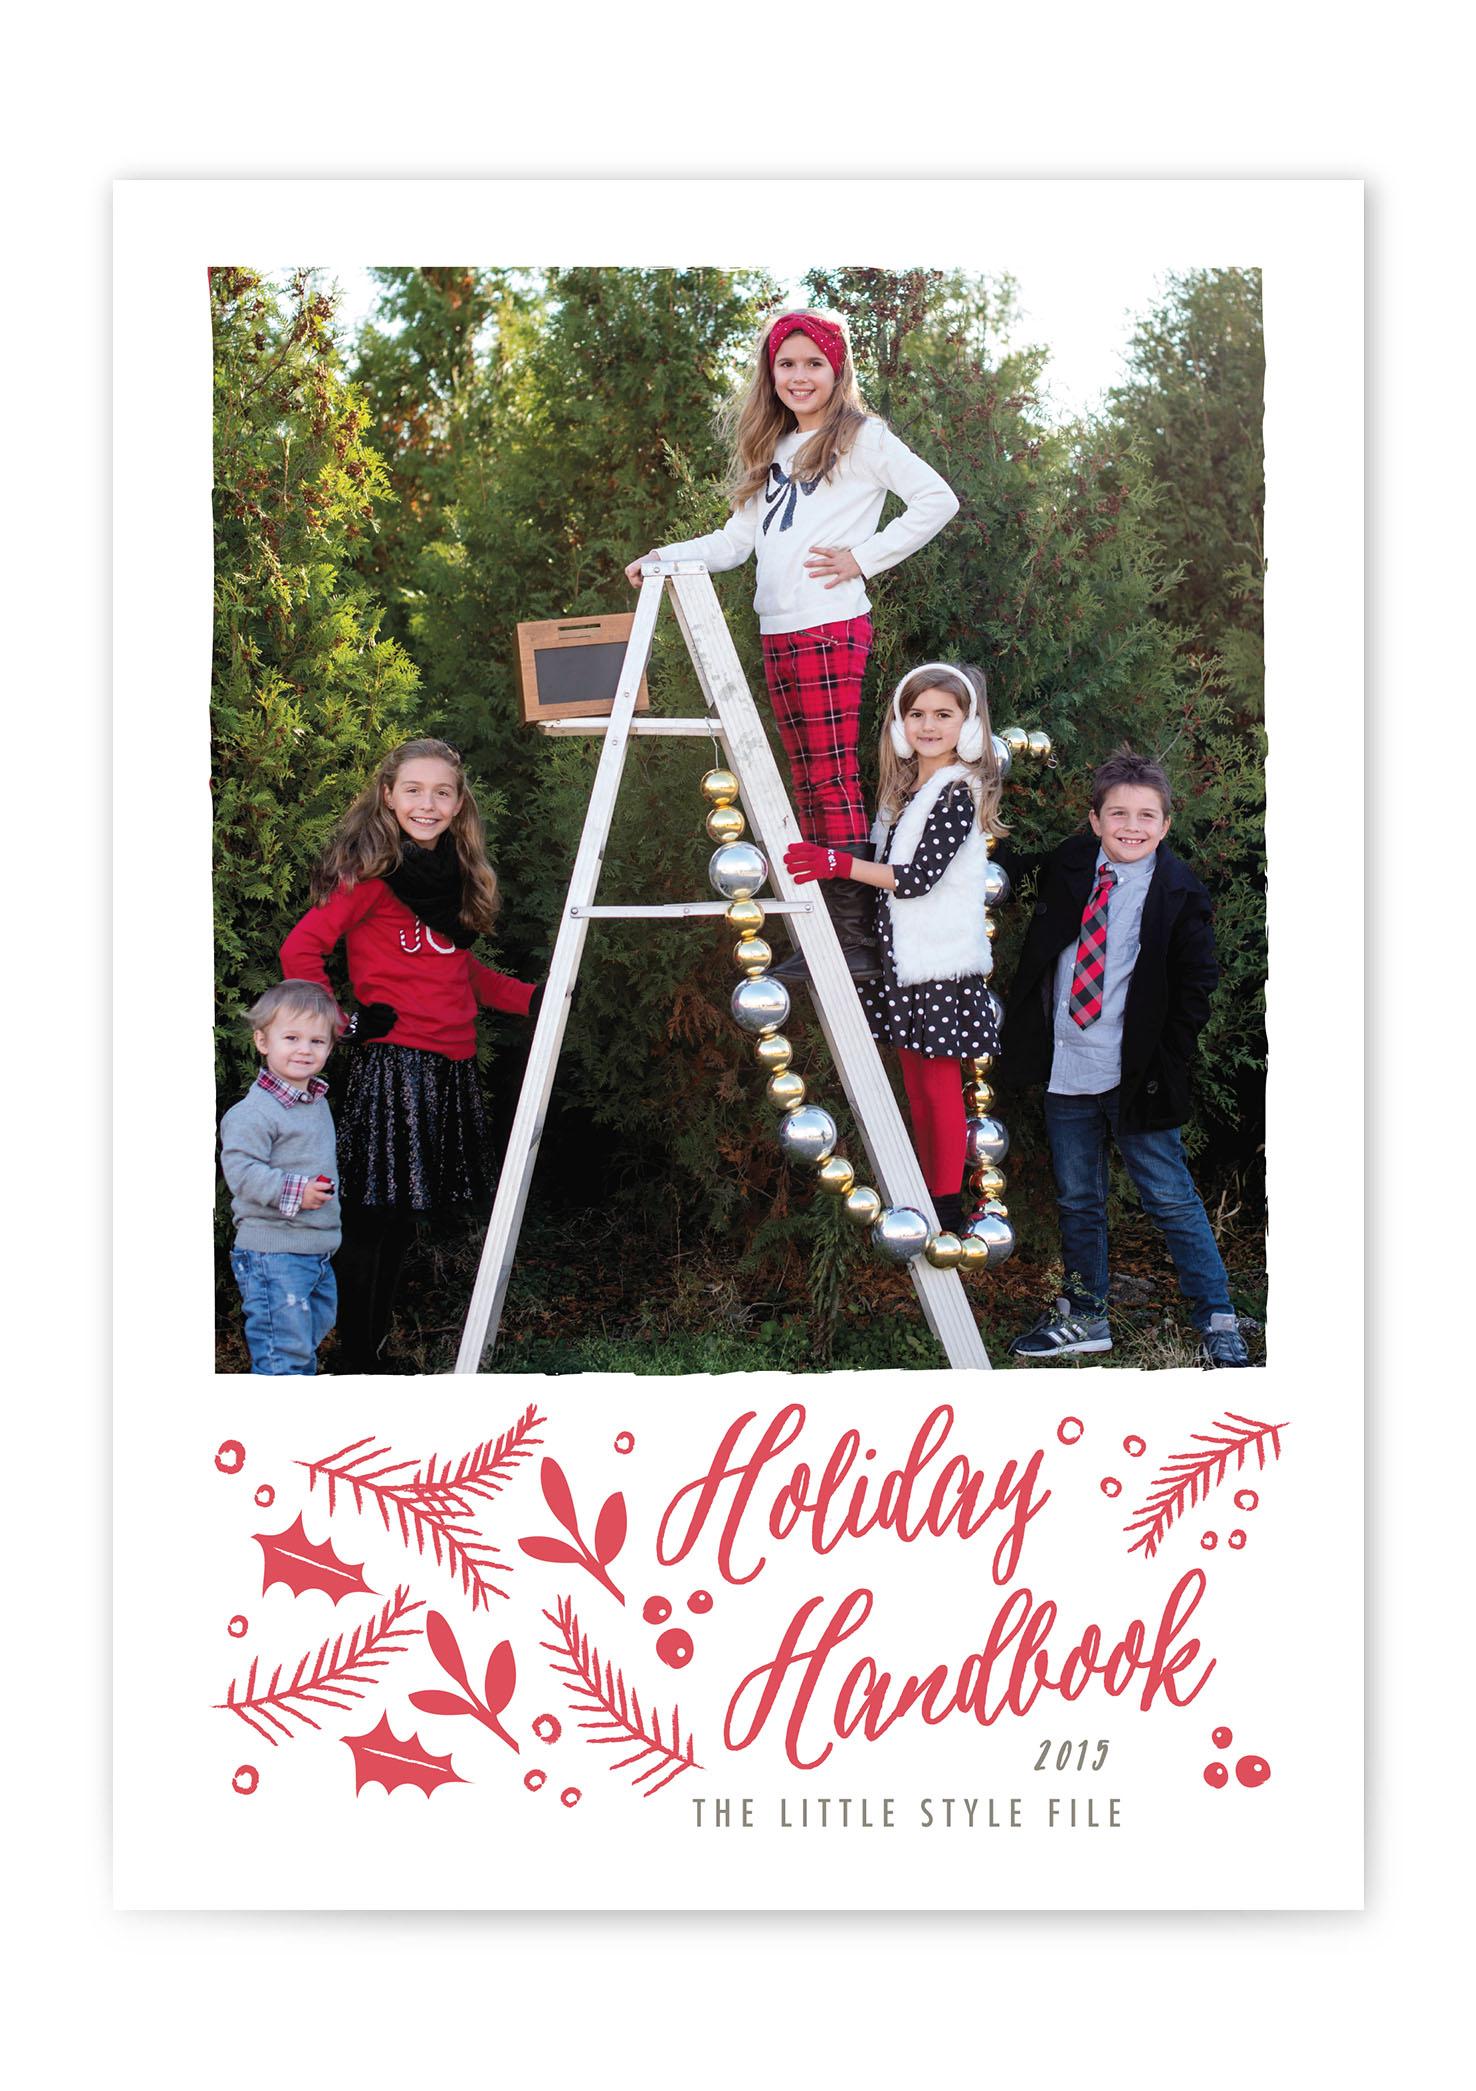 Holiday Handbook cover.jpg